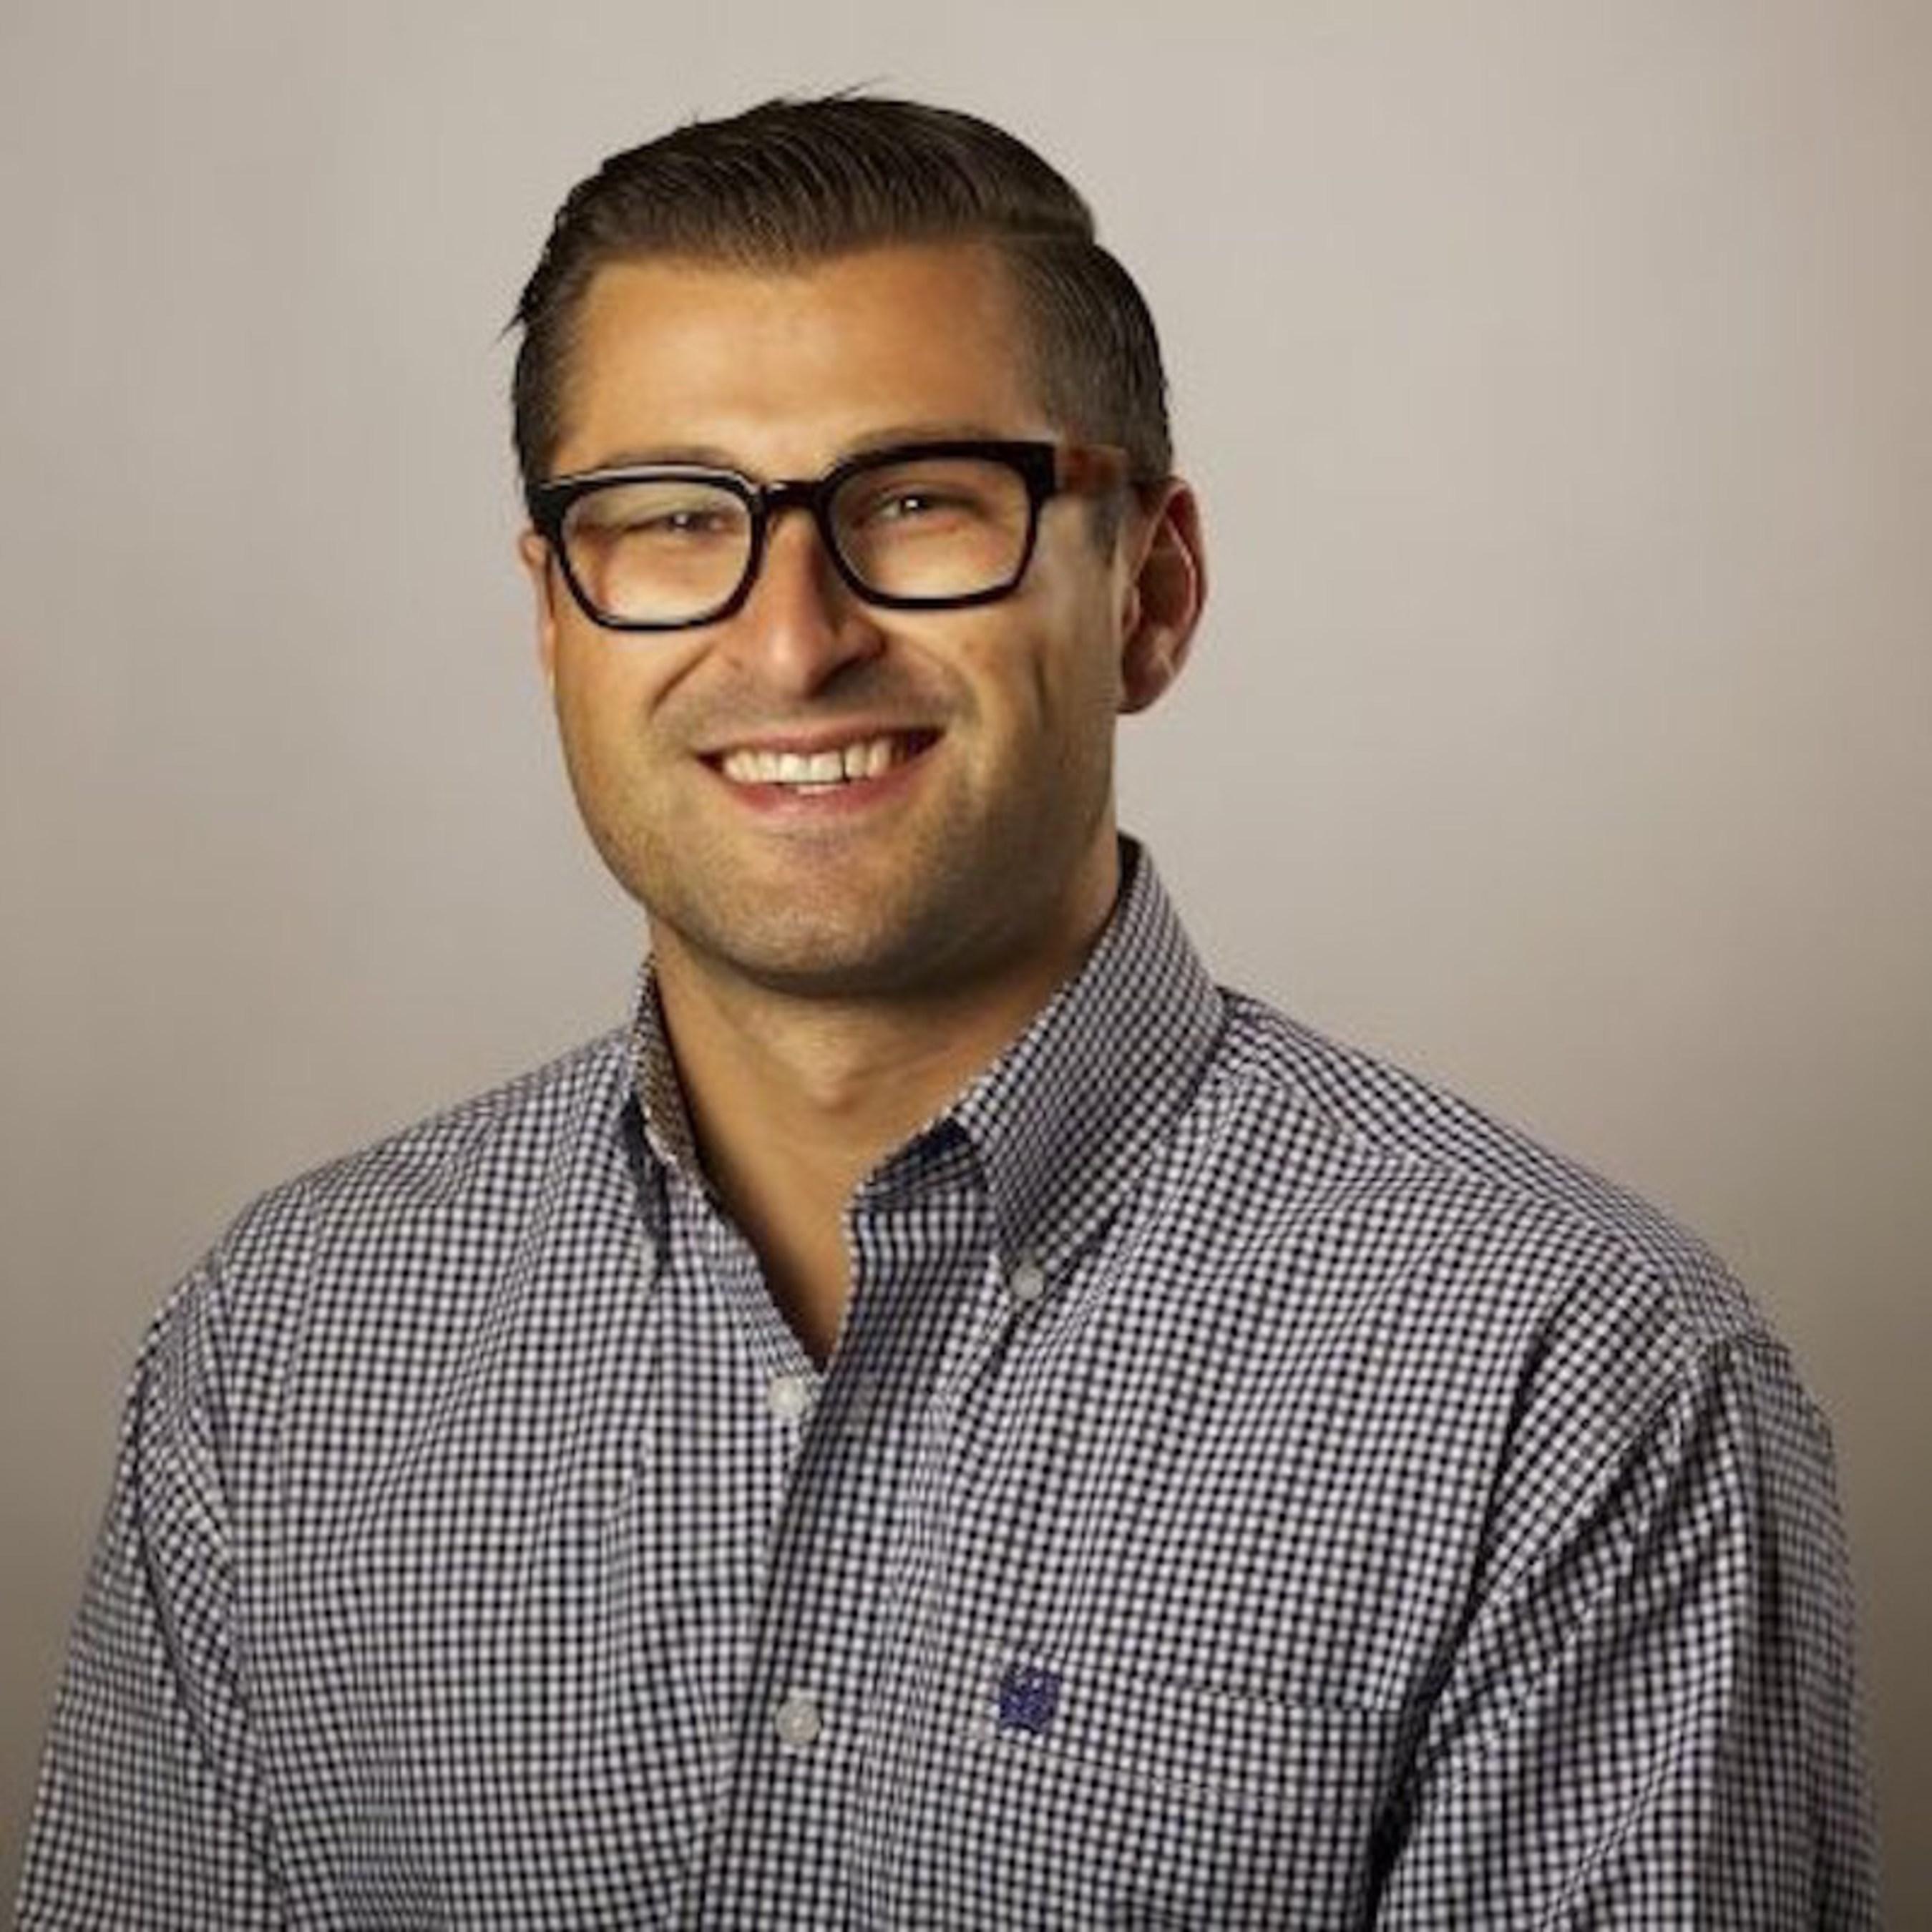 Aaron Halimi Joins Gardner Capital as Senior Vice President, Solar Development